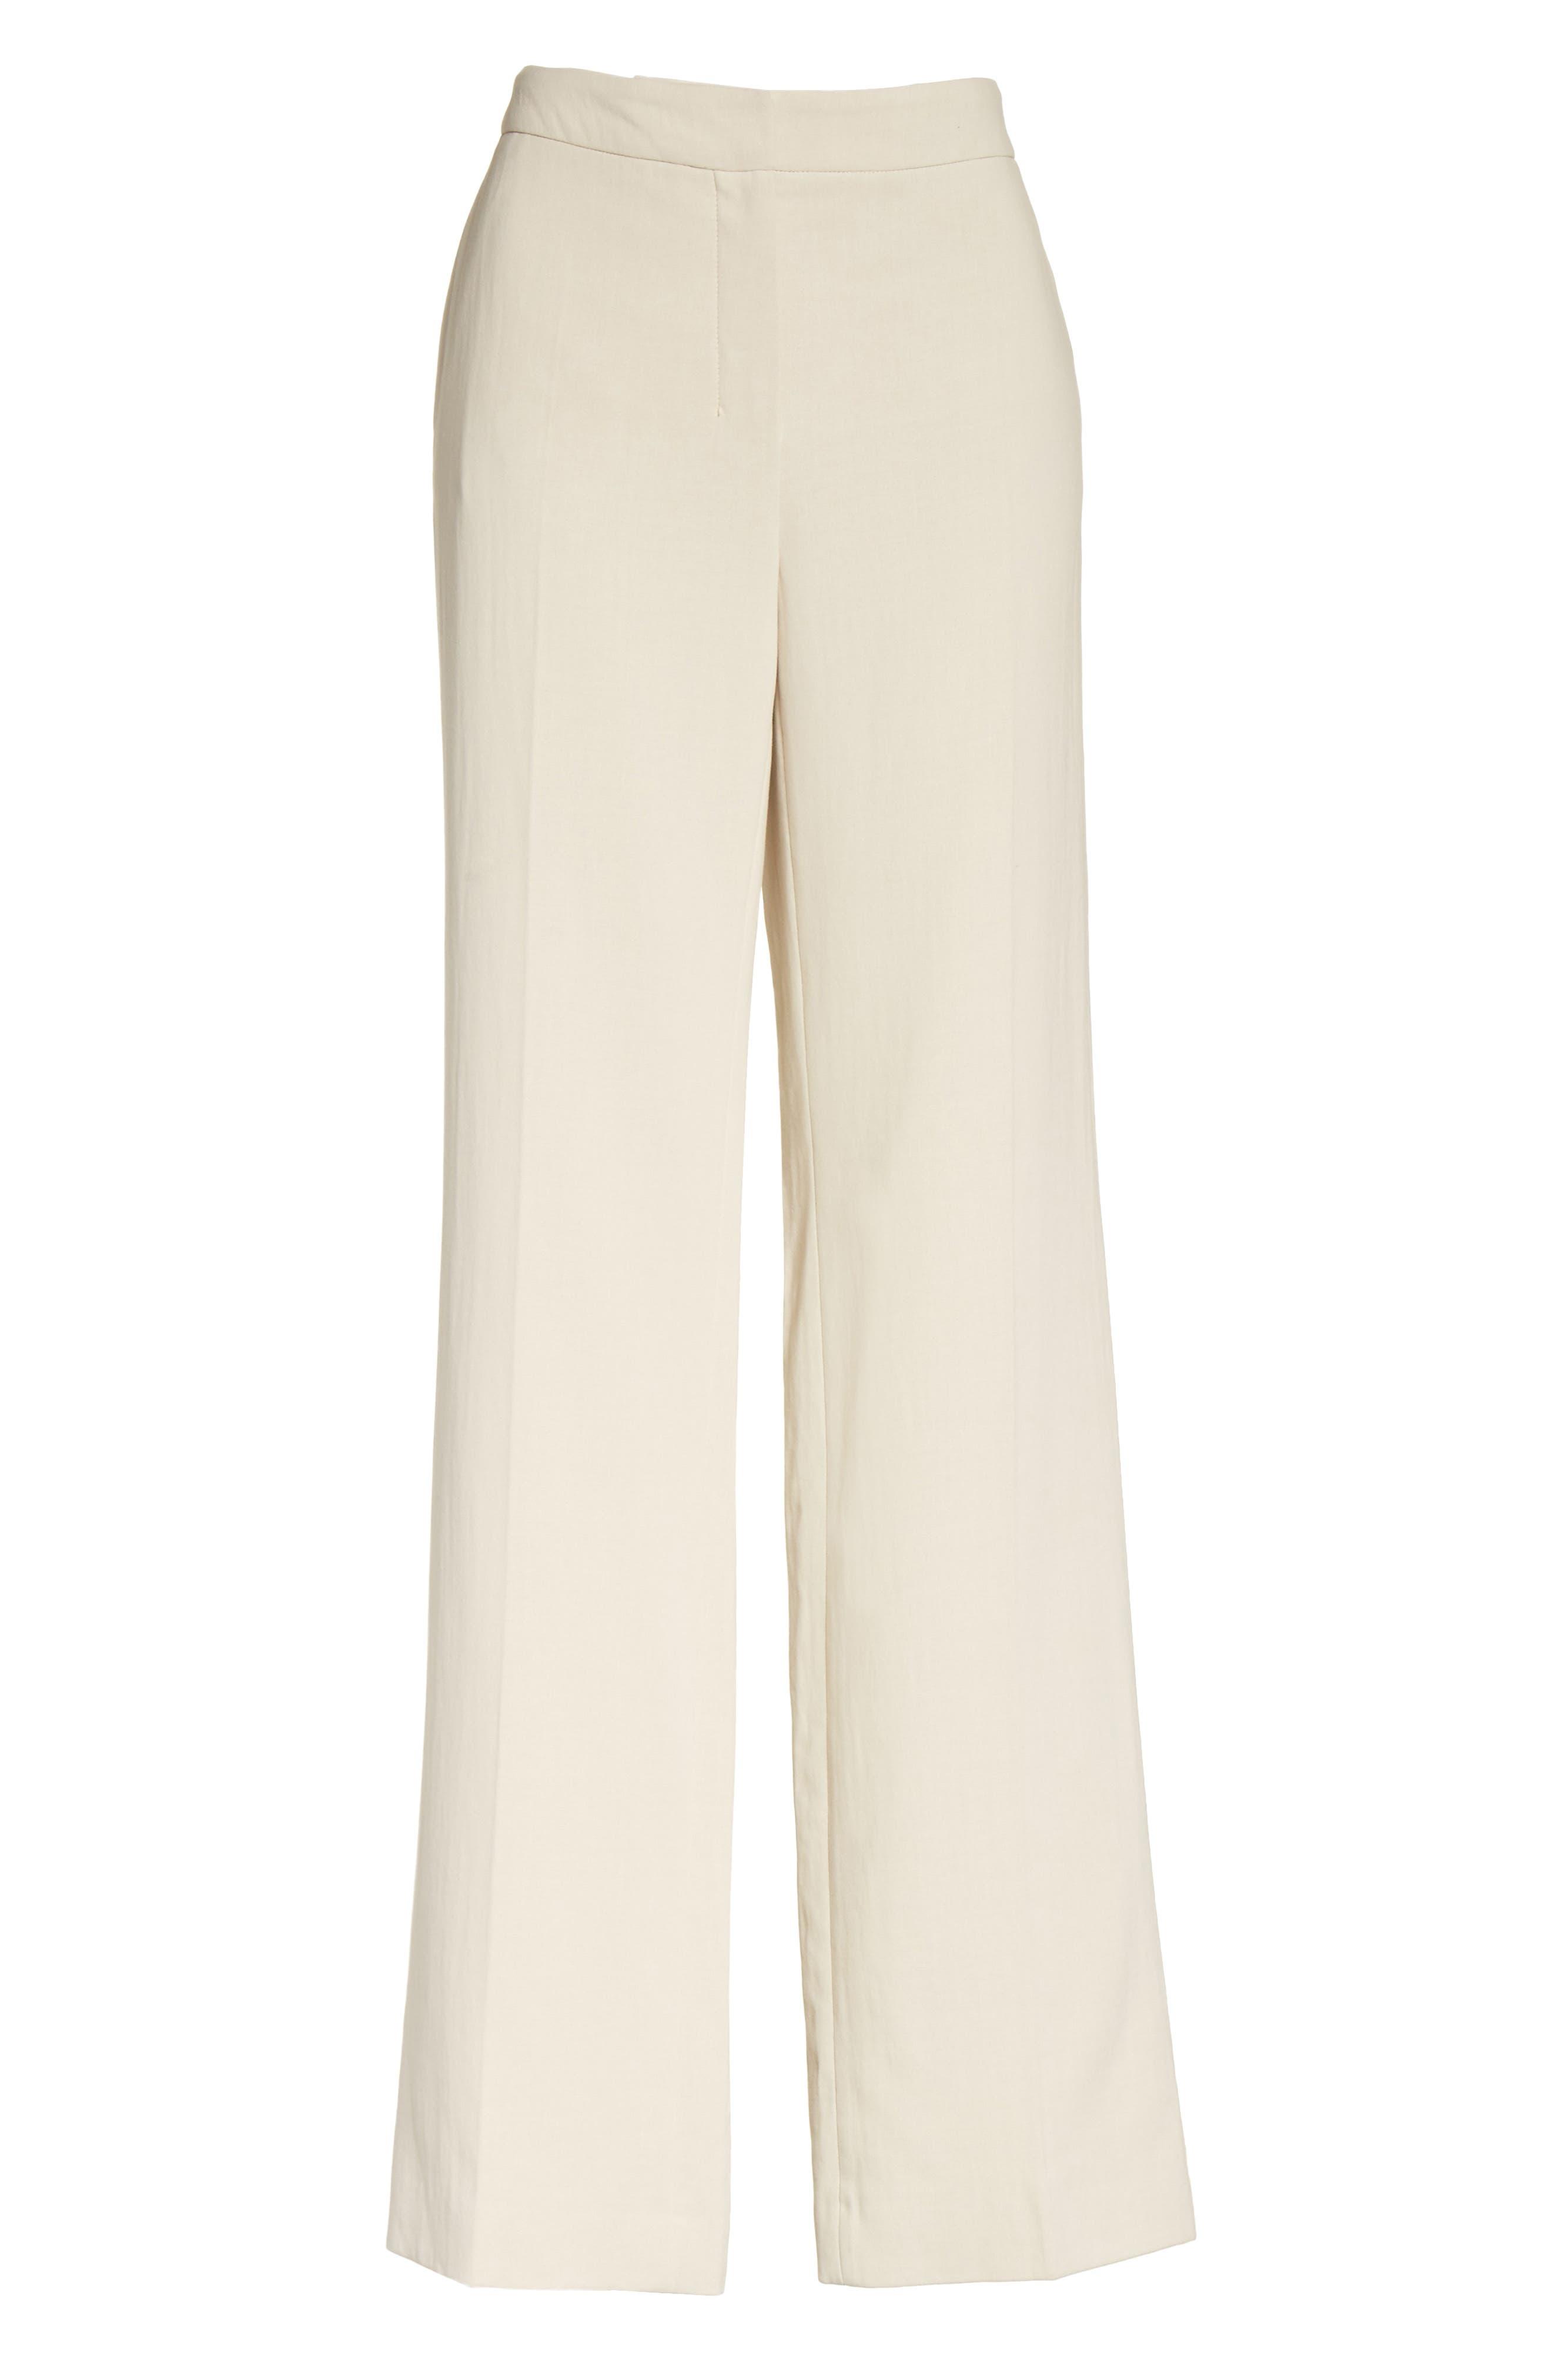 MAX MARA, Cursore Cotton Wide Leg Pants, Alternate thumbnail 6, color, 900